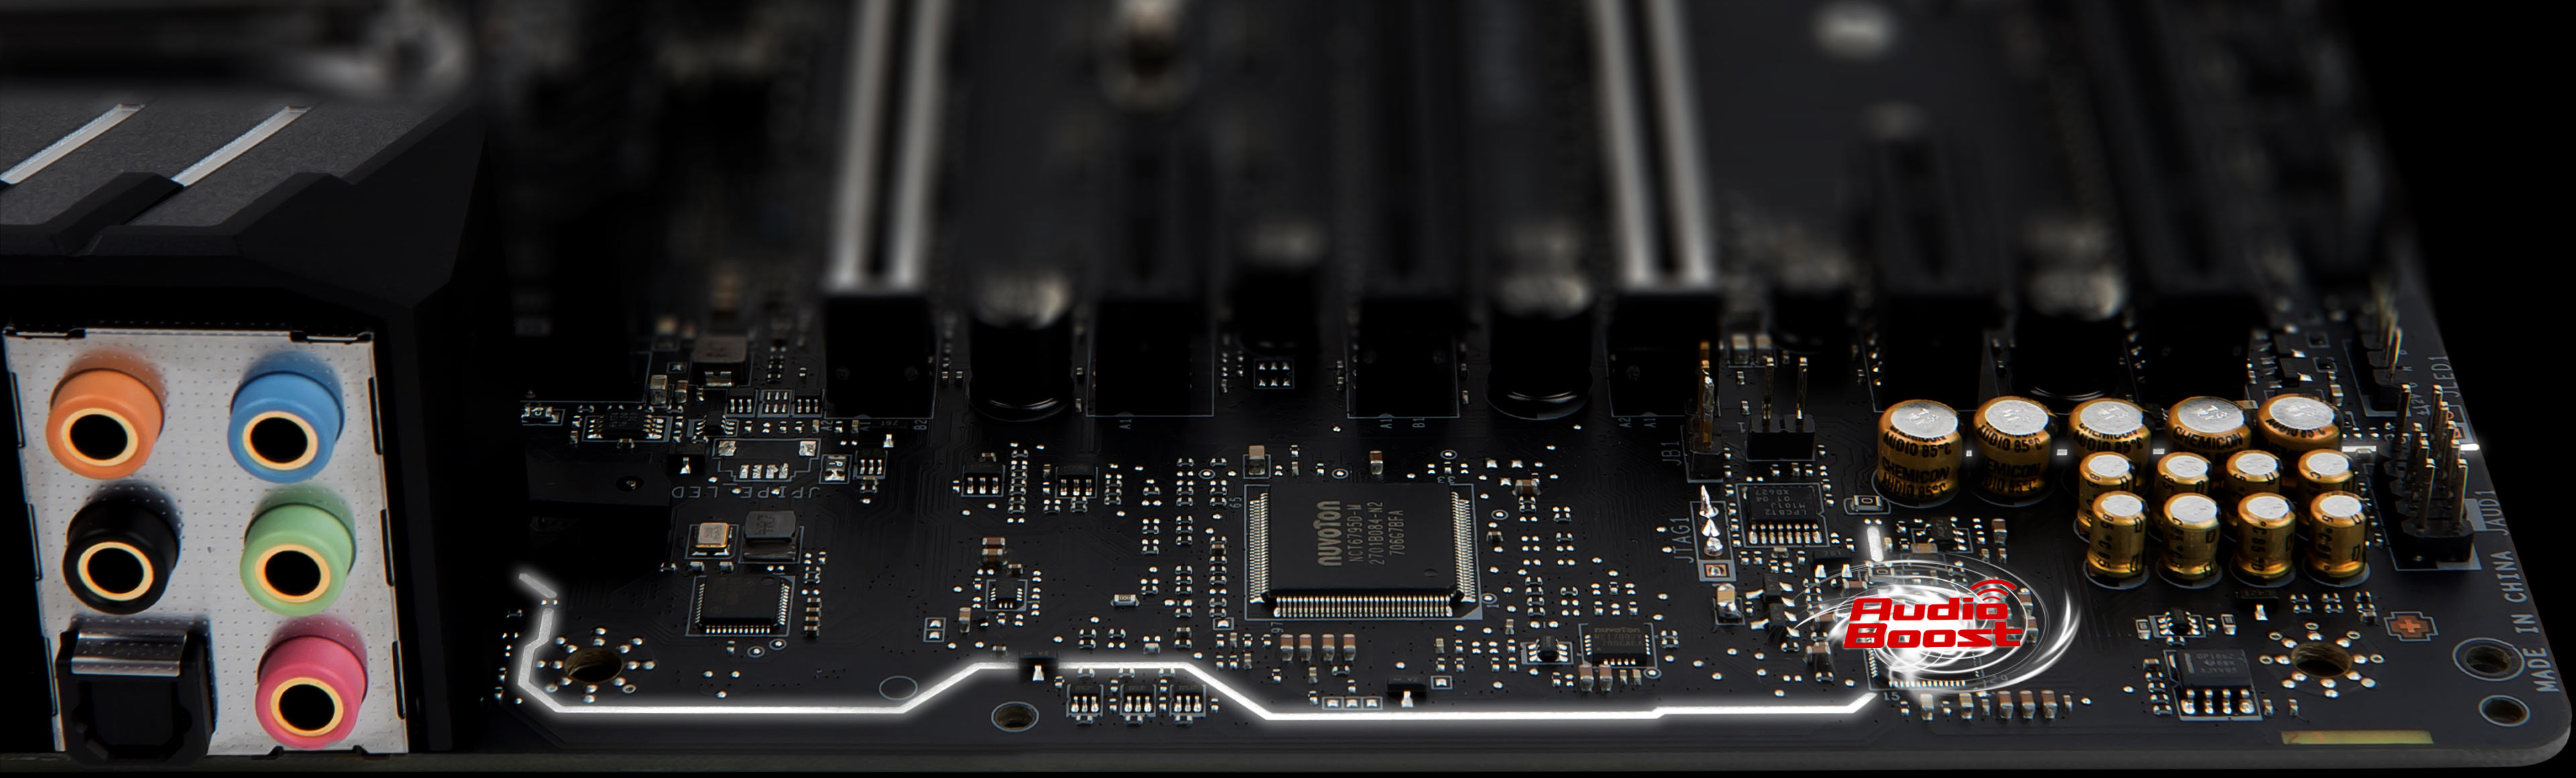 For Design Workstation Build Msi X299 Sli Plus Motherboard Wiring Diagram Linear Actuator Super Jack Audio